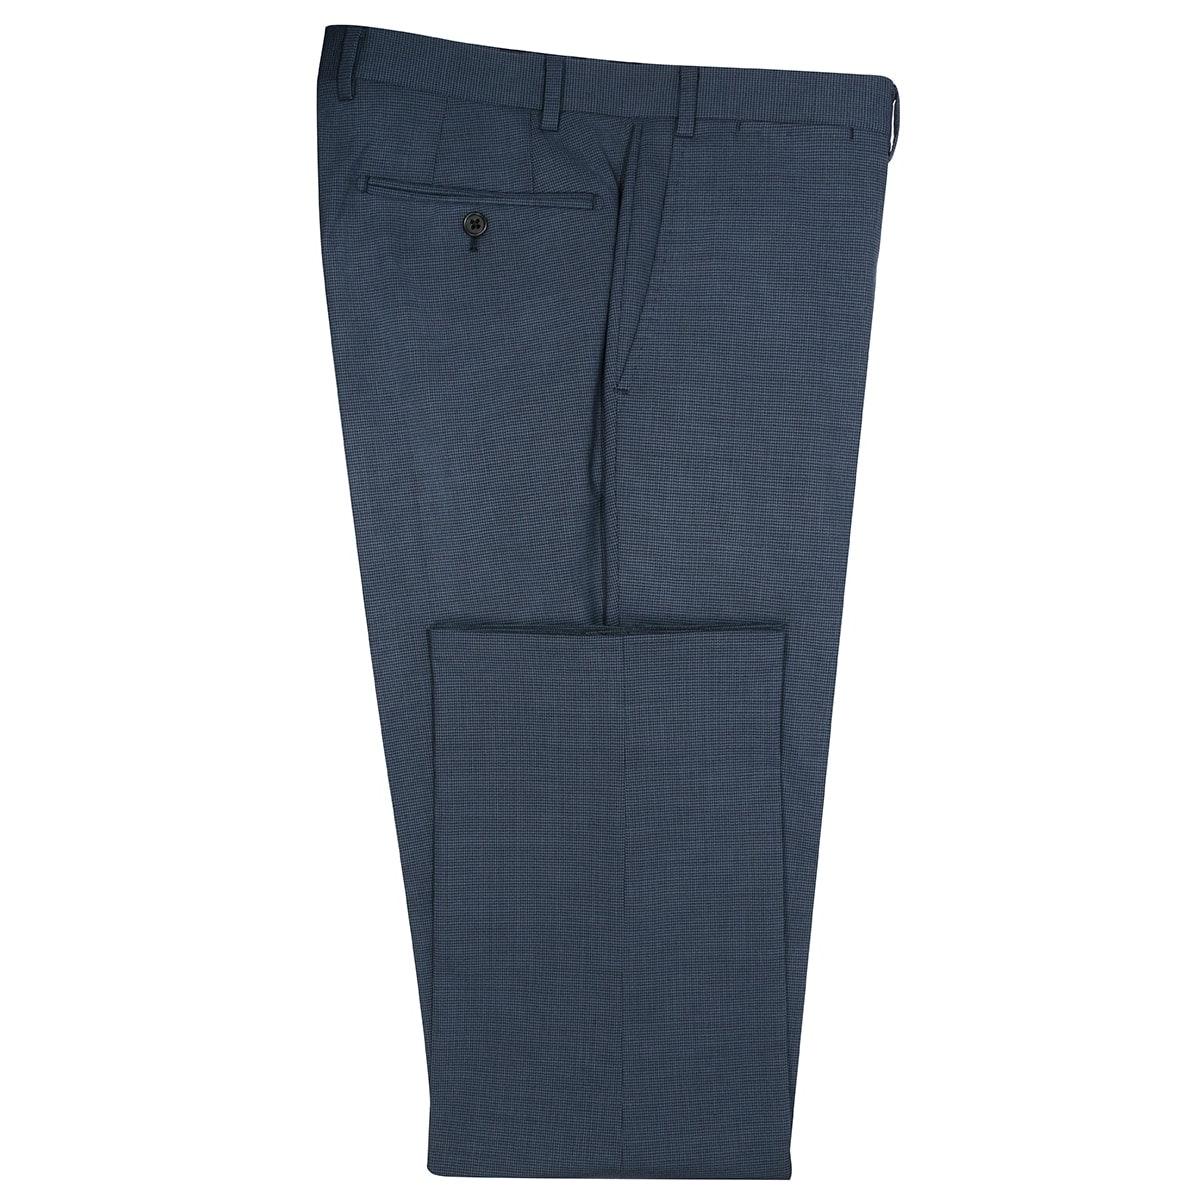 InStitchu Collection Spangle Blue Birdseye Wool Blend Pants